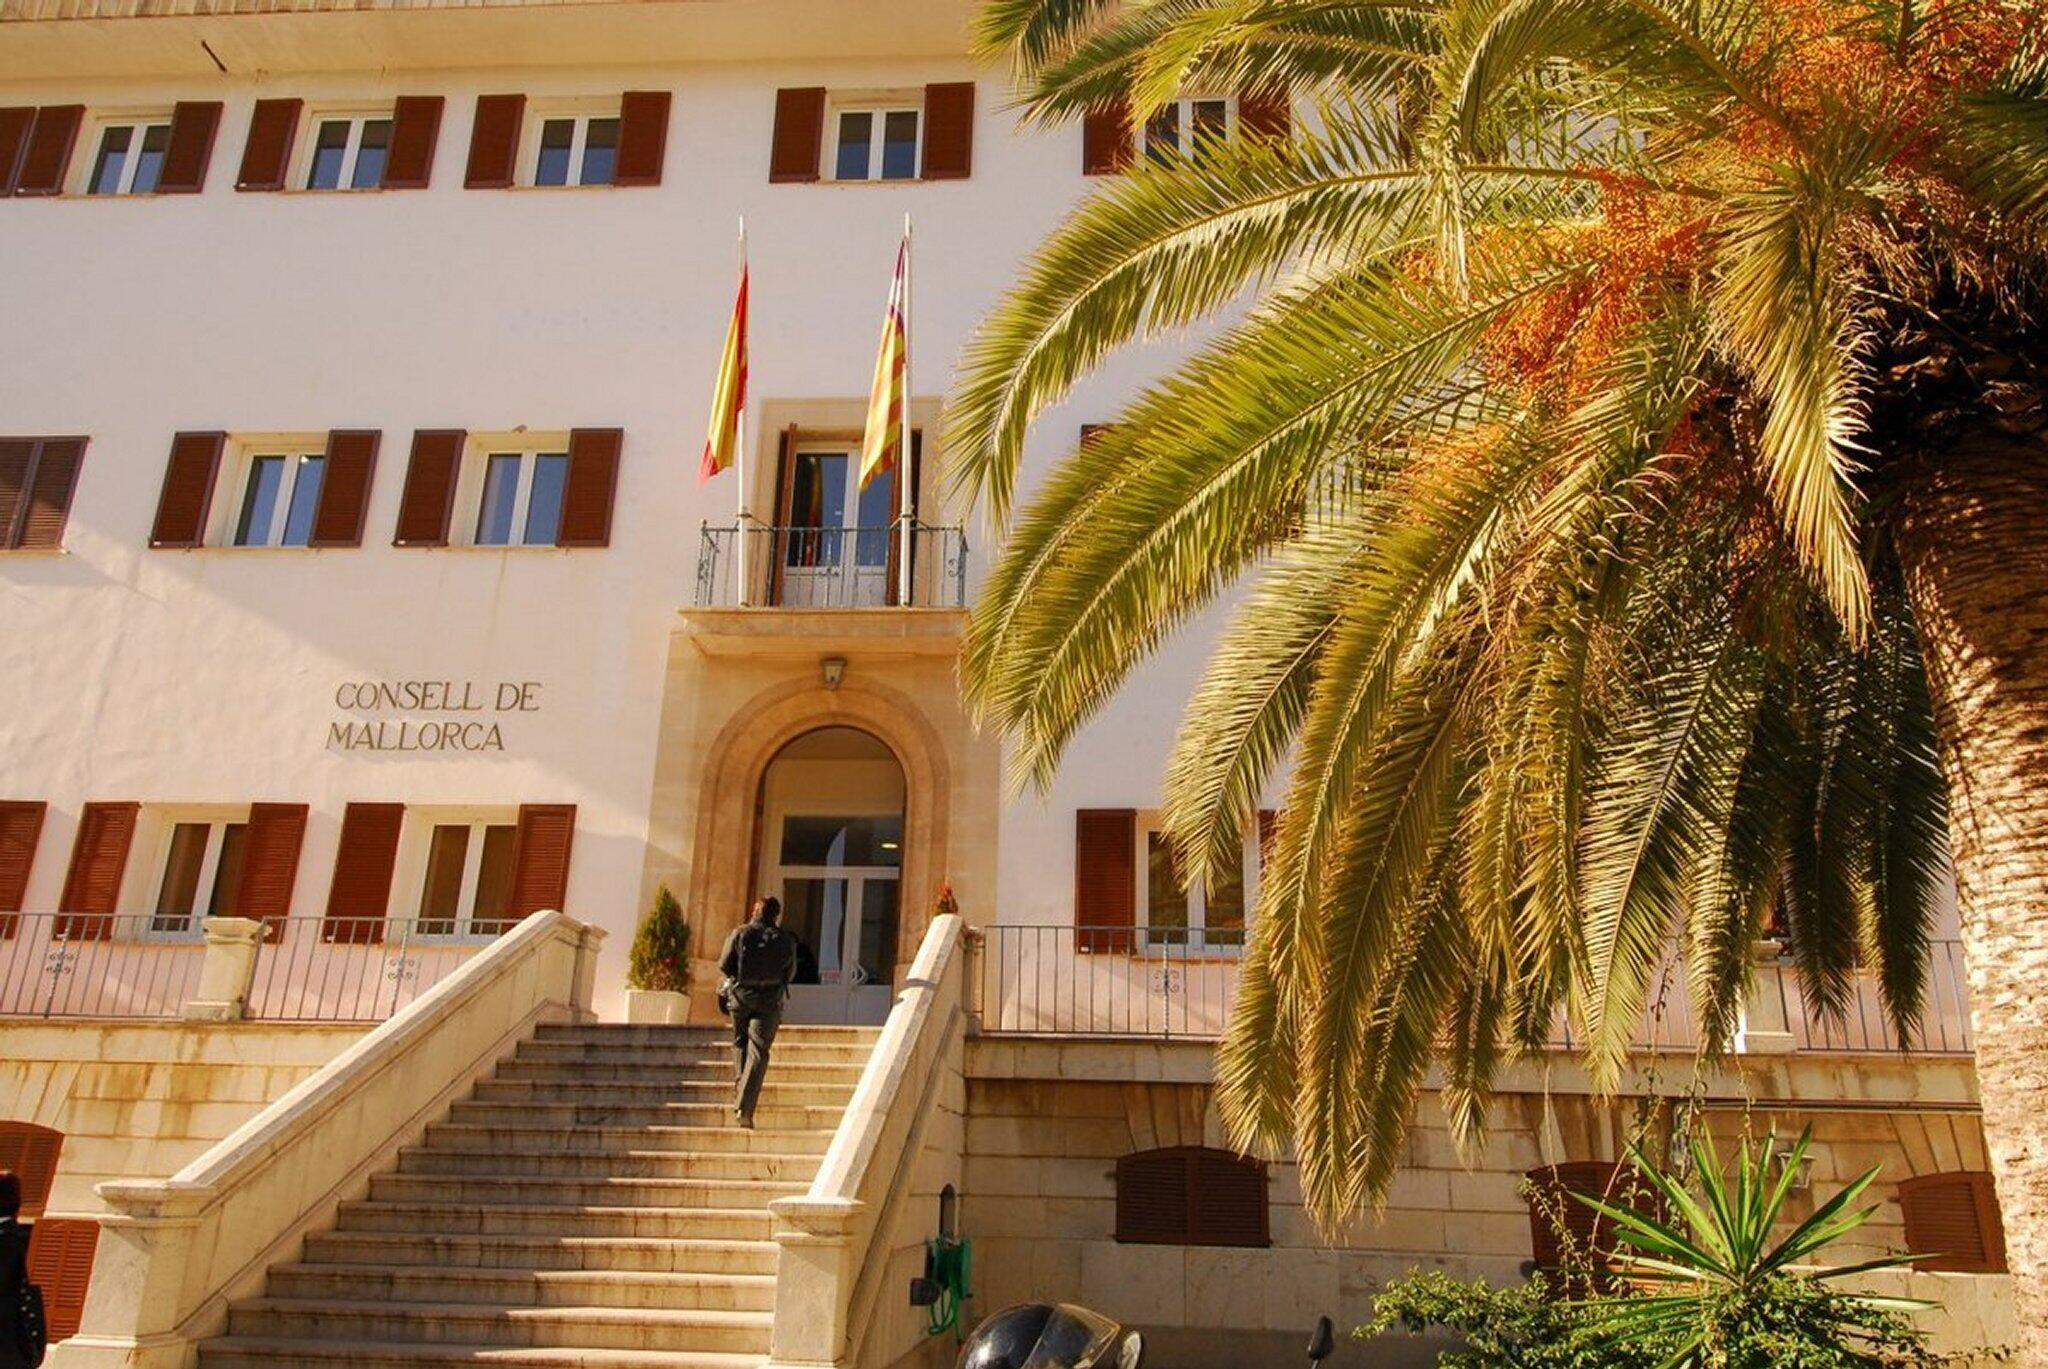 Bild zu Skandal um Missbrauch von Heimkindern erschüttert Mallorca